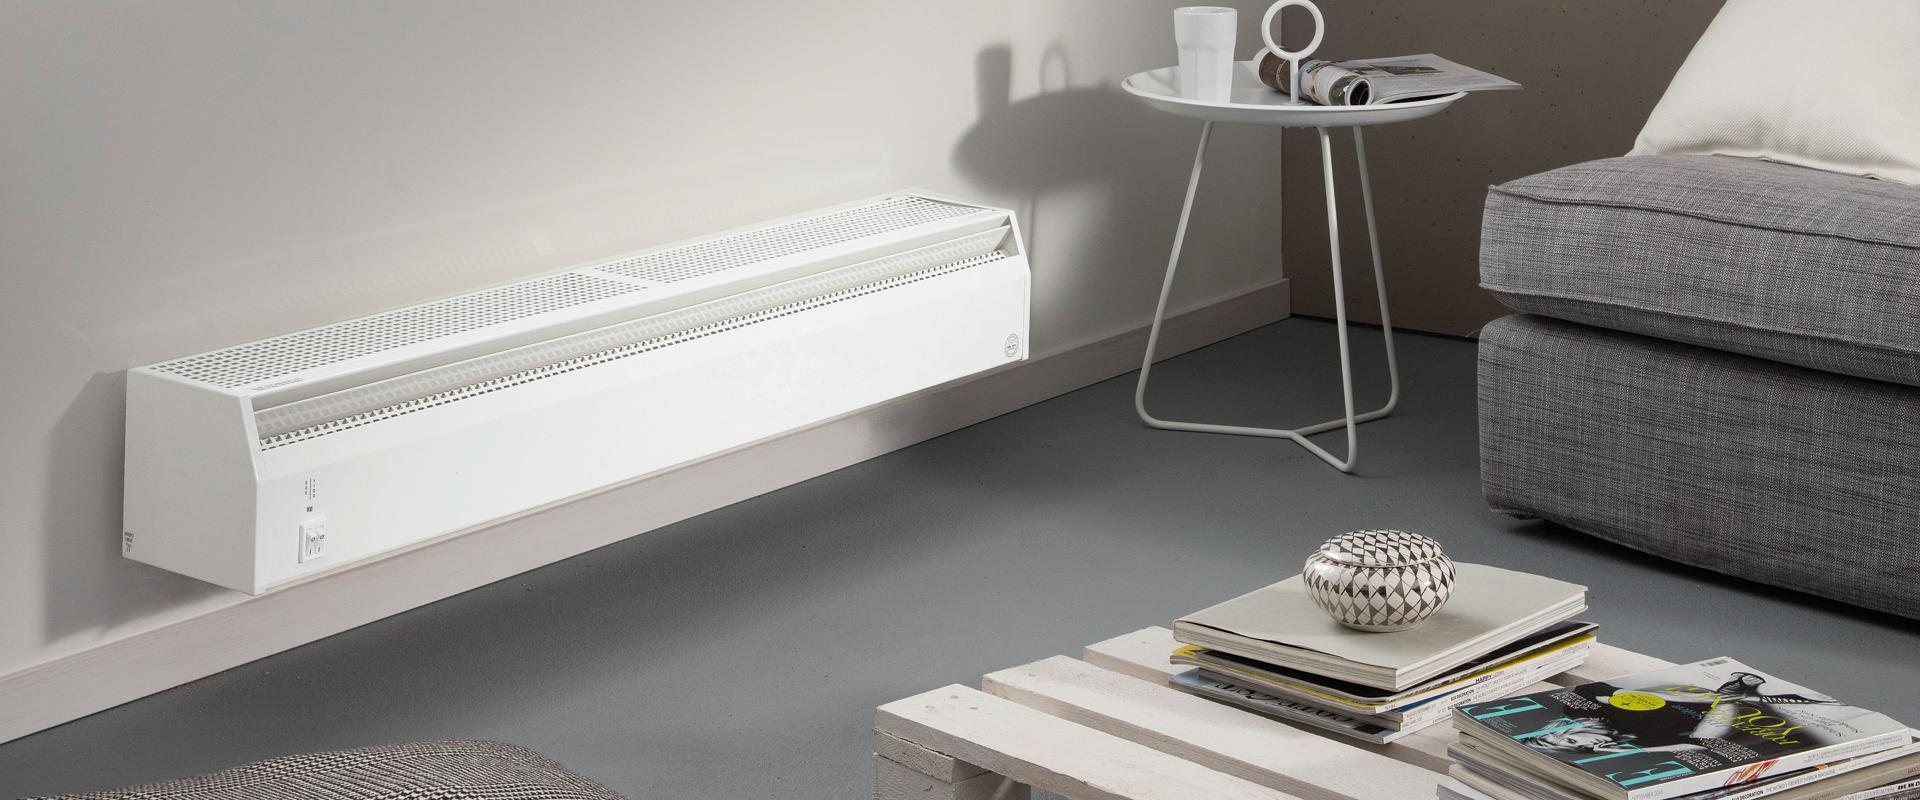 fu leistenheizung elektrisch. Black Bedroom Furniture Sets. Home Design Ideas